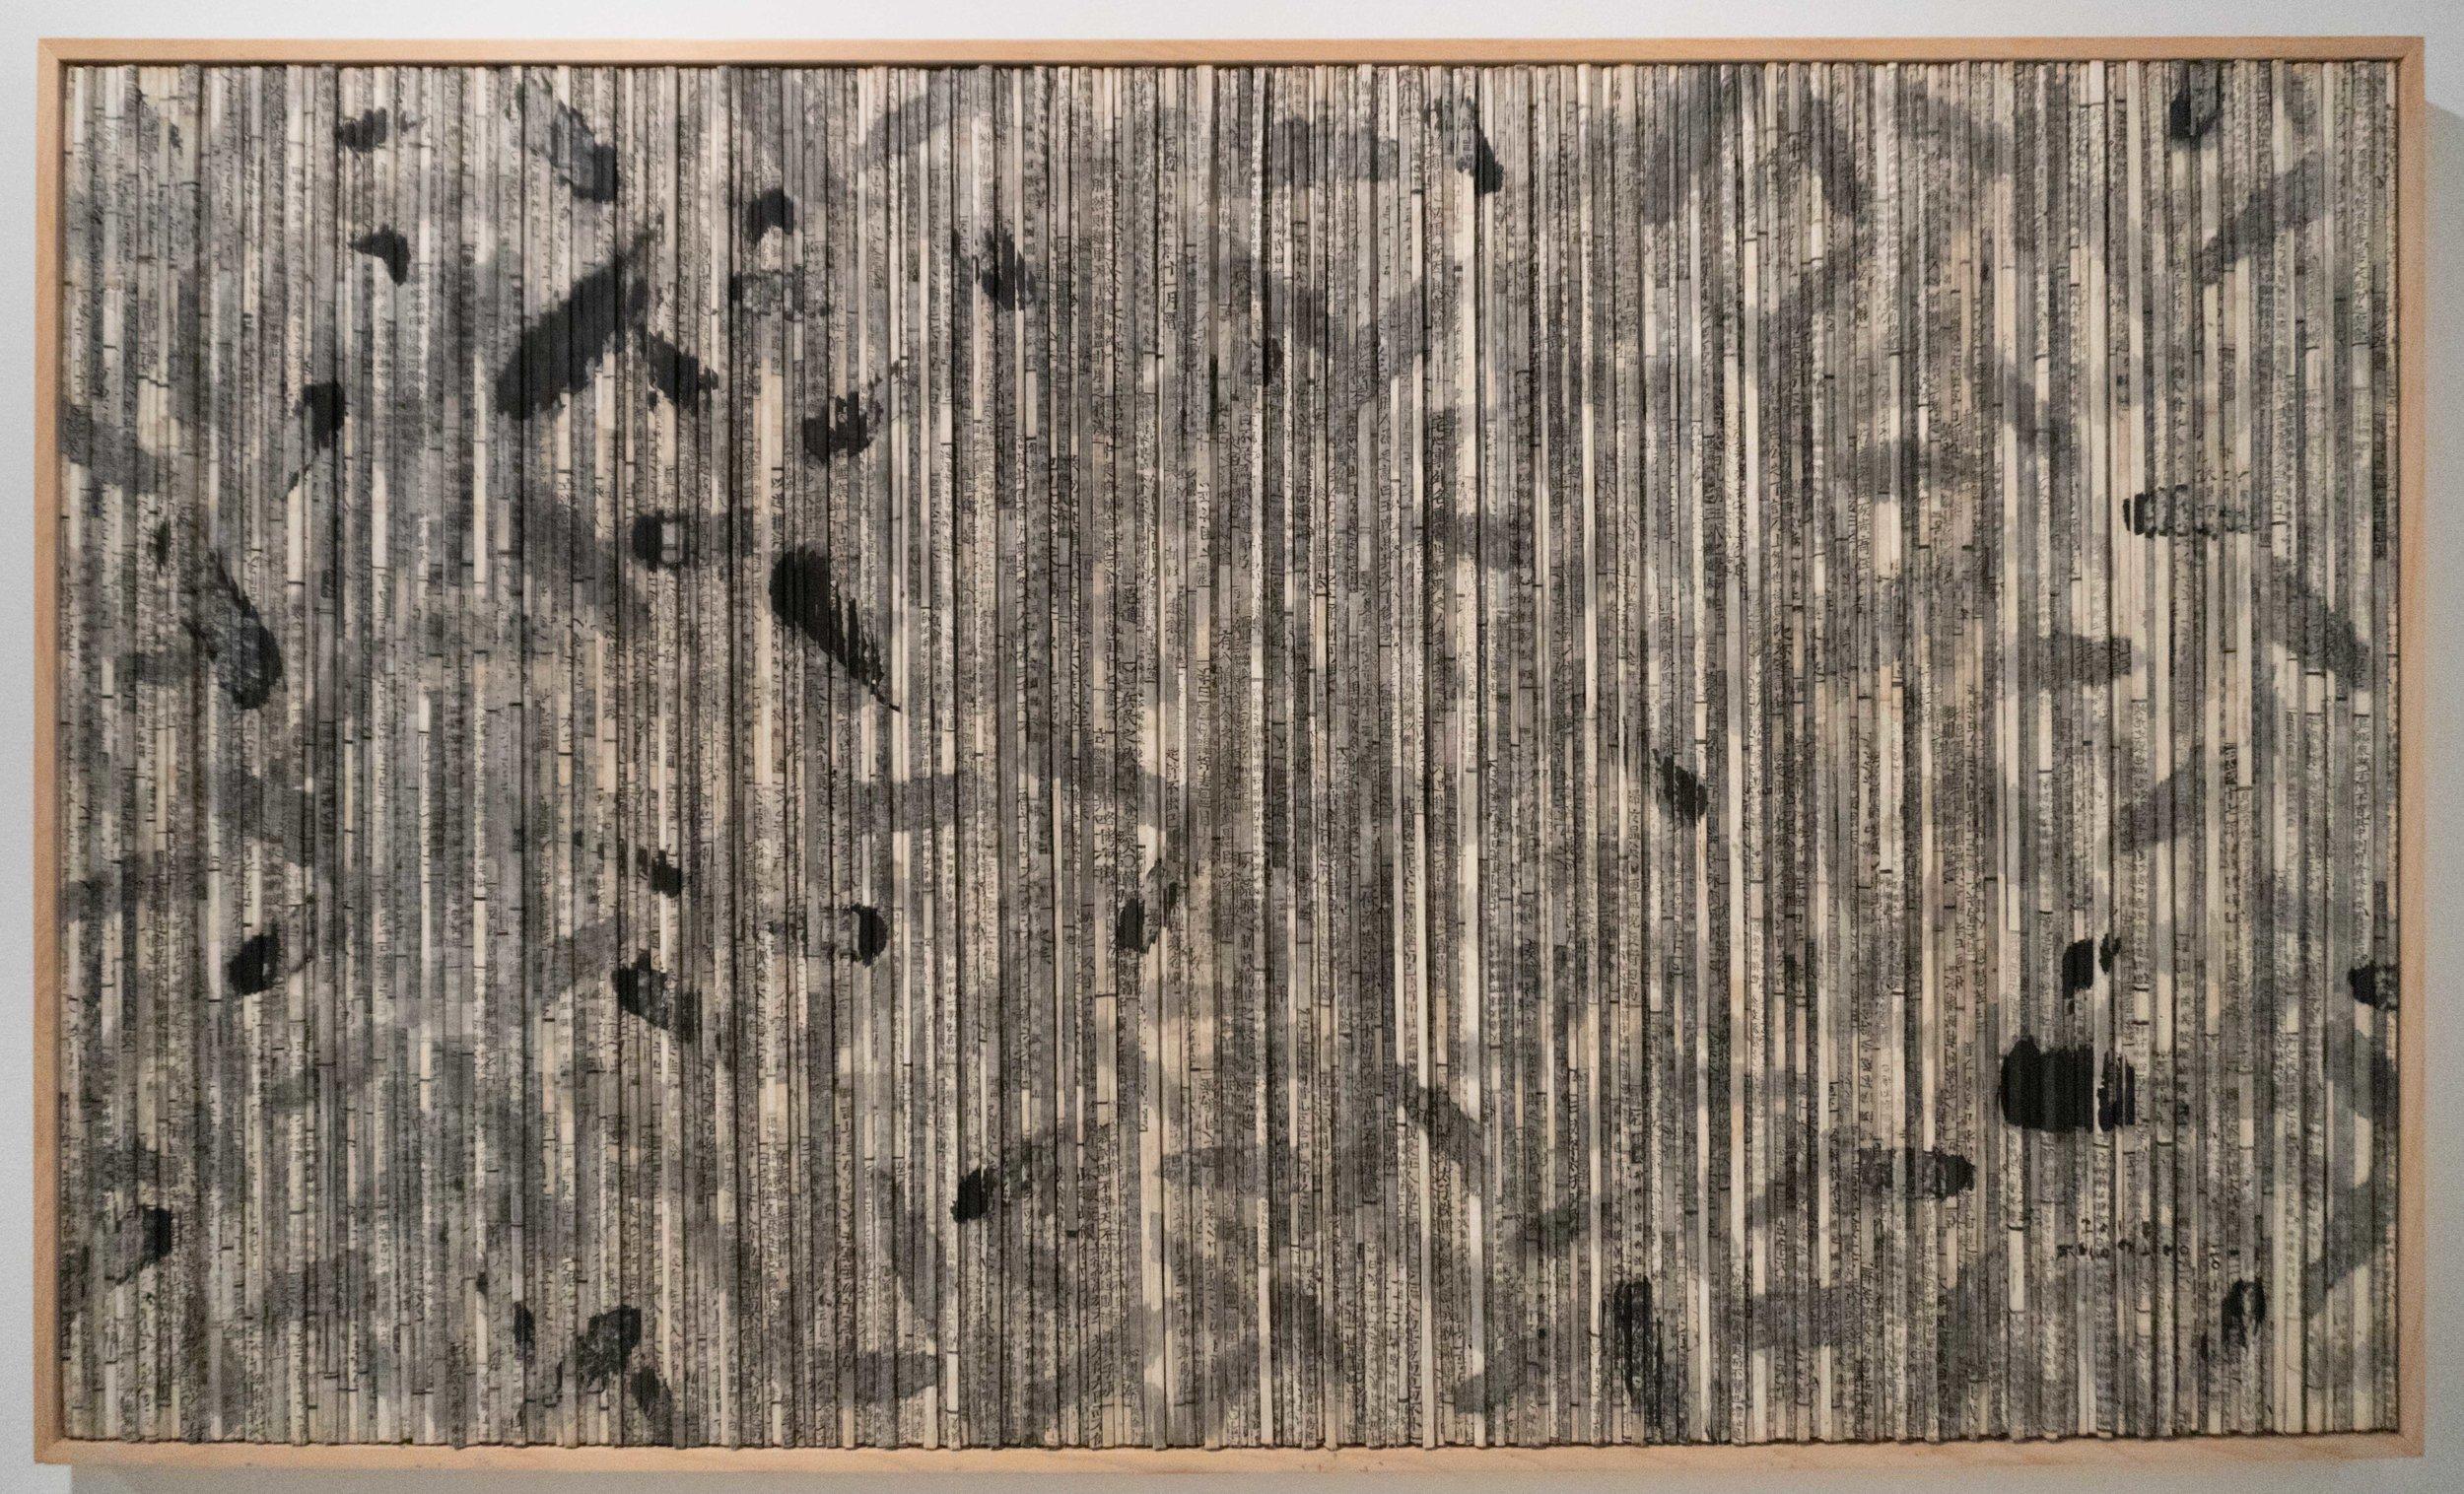 Jeong Gwang Hee 정광희 b. 1971   In the Bamboo Forest-1 대숲에서-1 2012 Ink on Hanji paper 39 ⅜ x 67 in